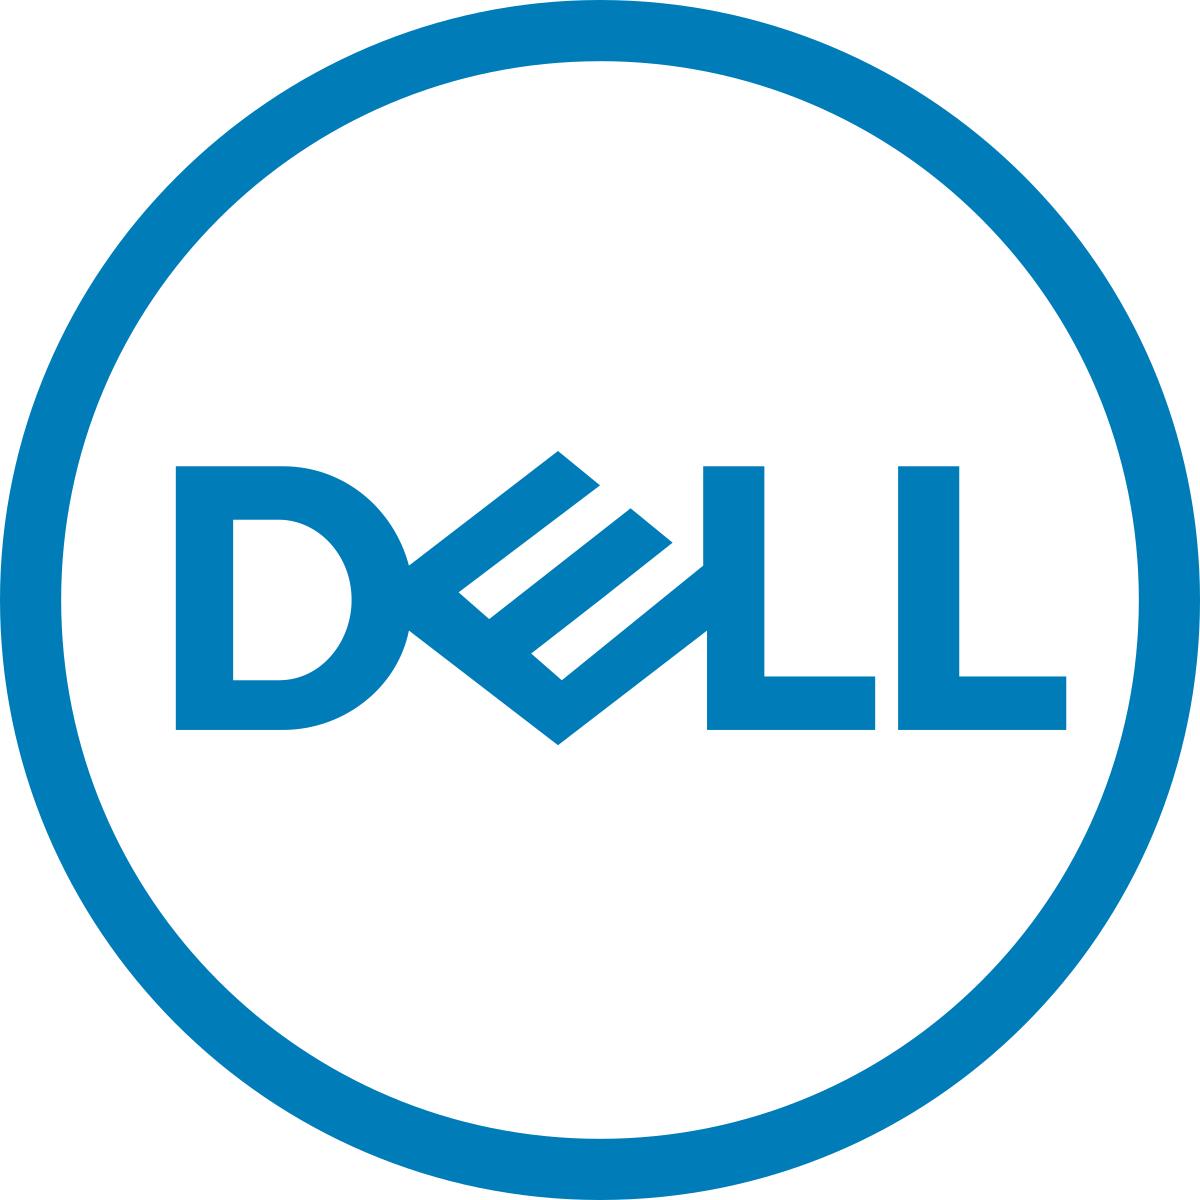 [Dell] -10% auf alle Notebooks & Desktops